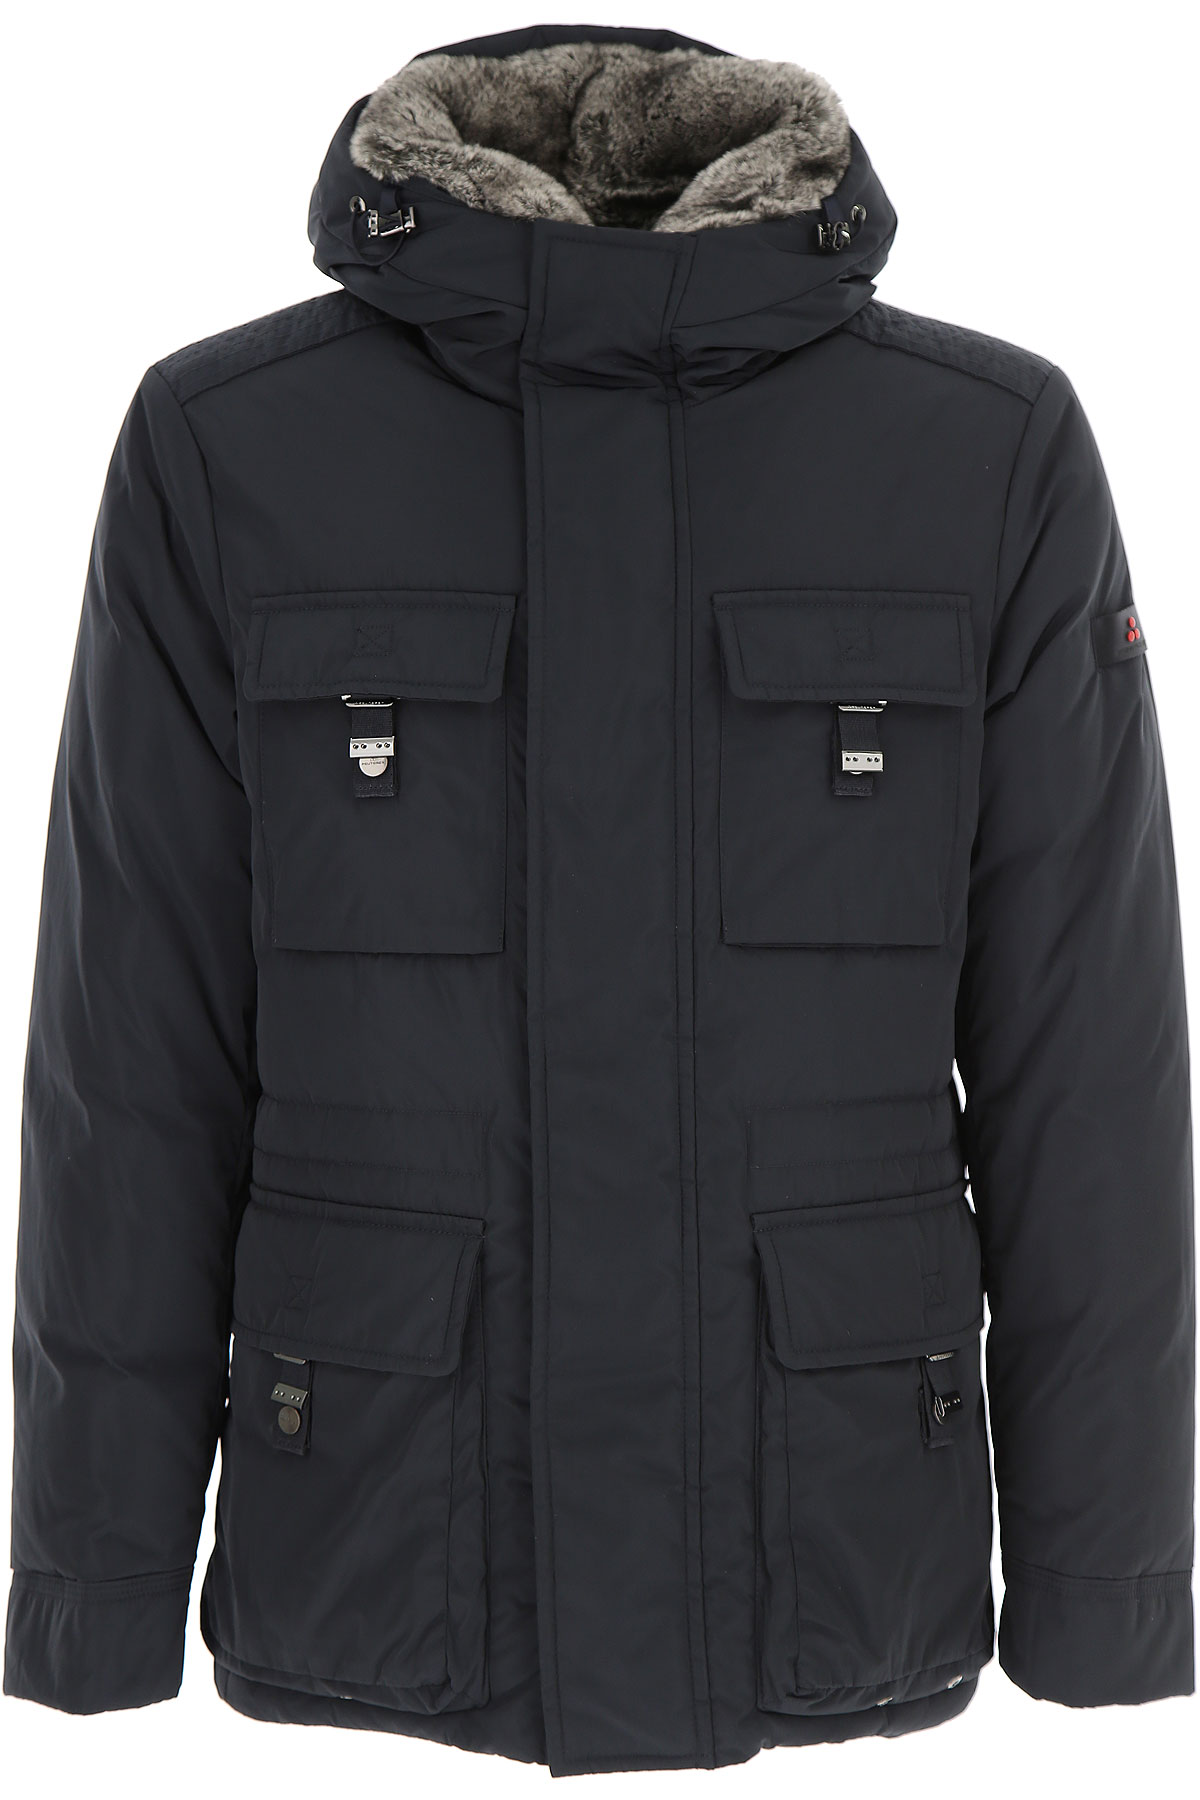 Peuterey Down Jacket for Men, Puffer Ski Jacket, Navy Blue, Down, 2019, L M S XL XXL